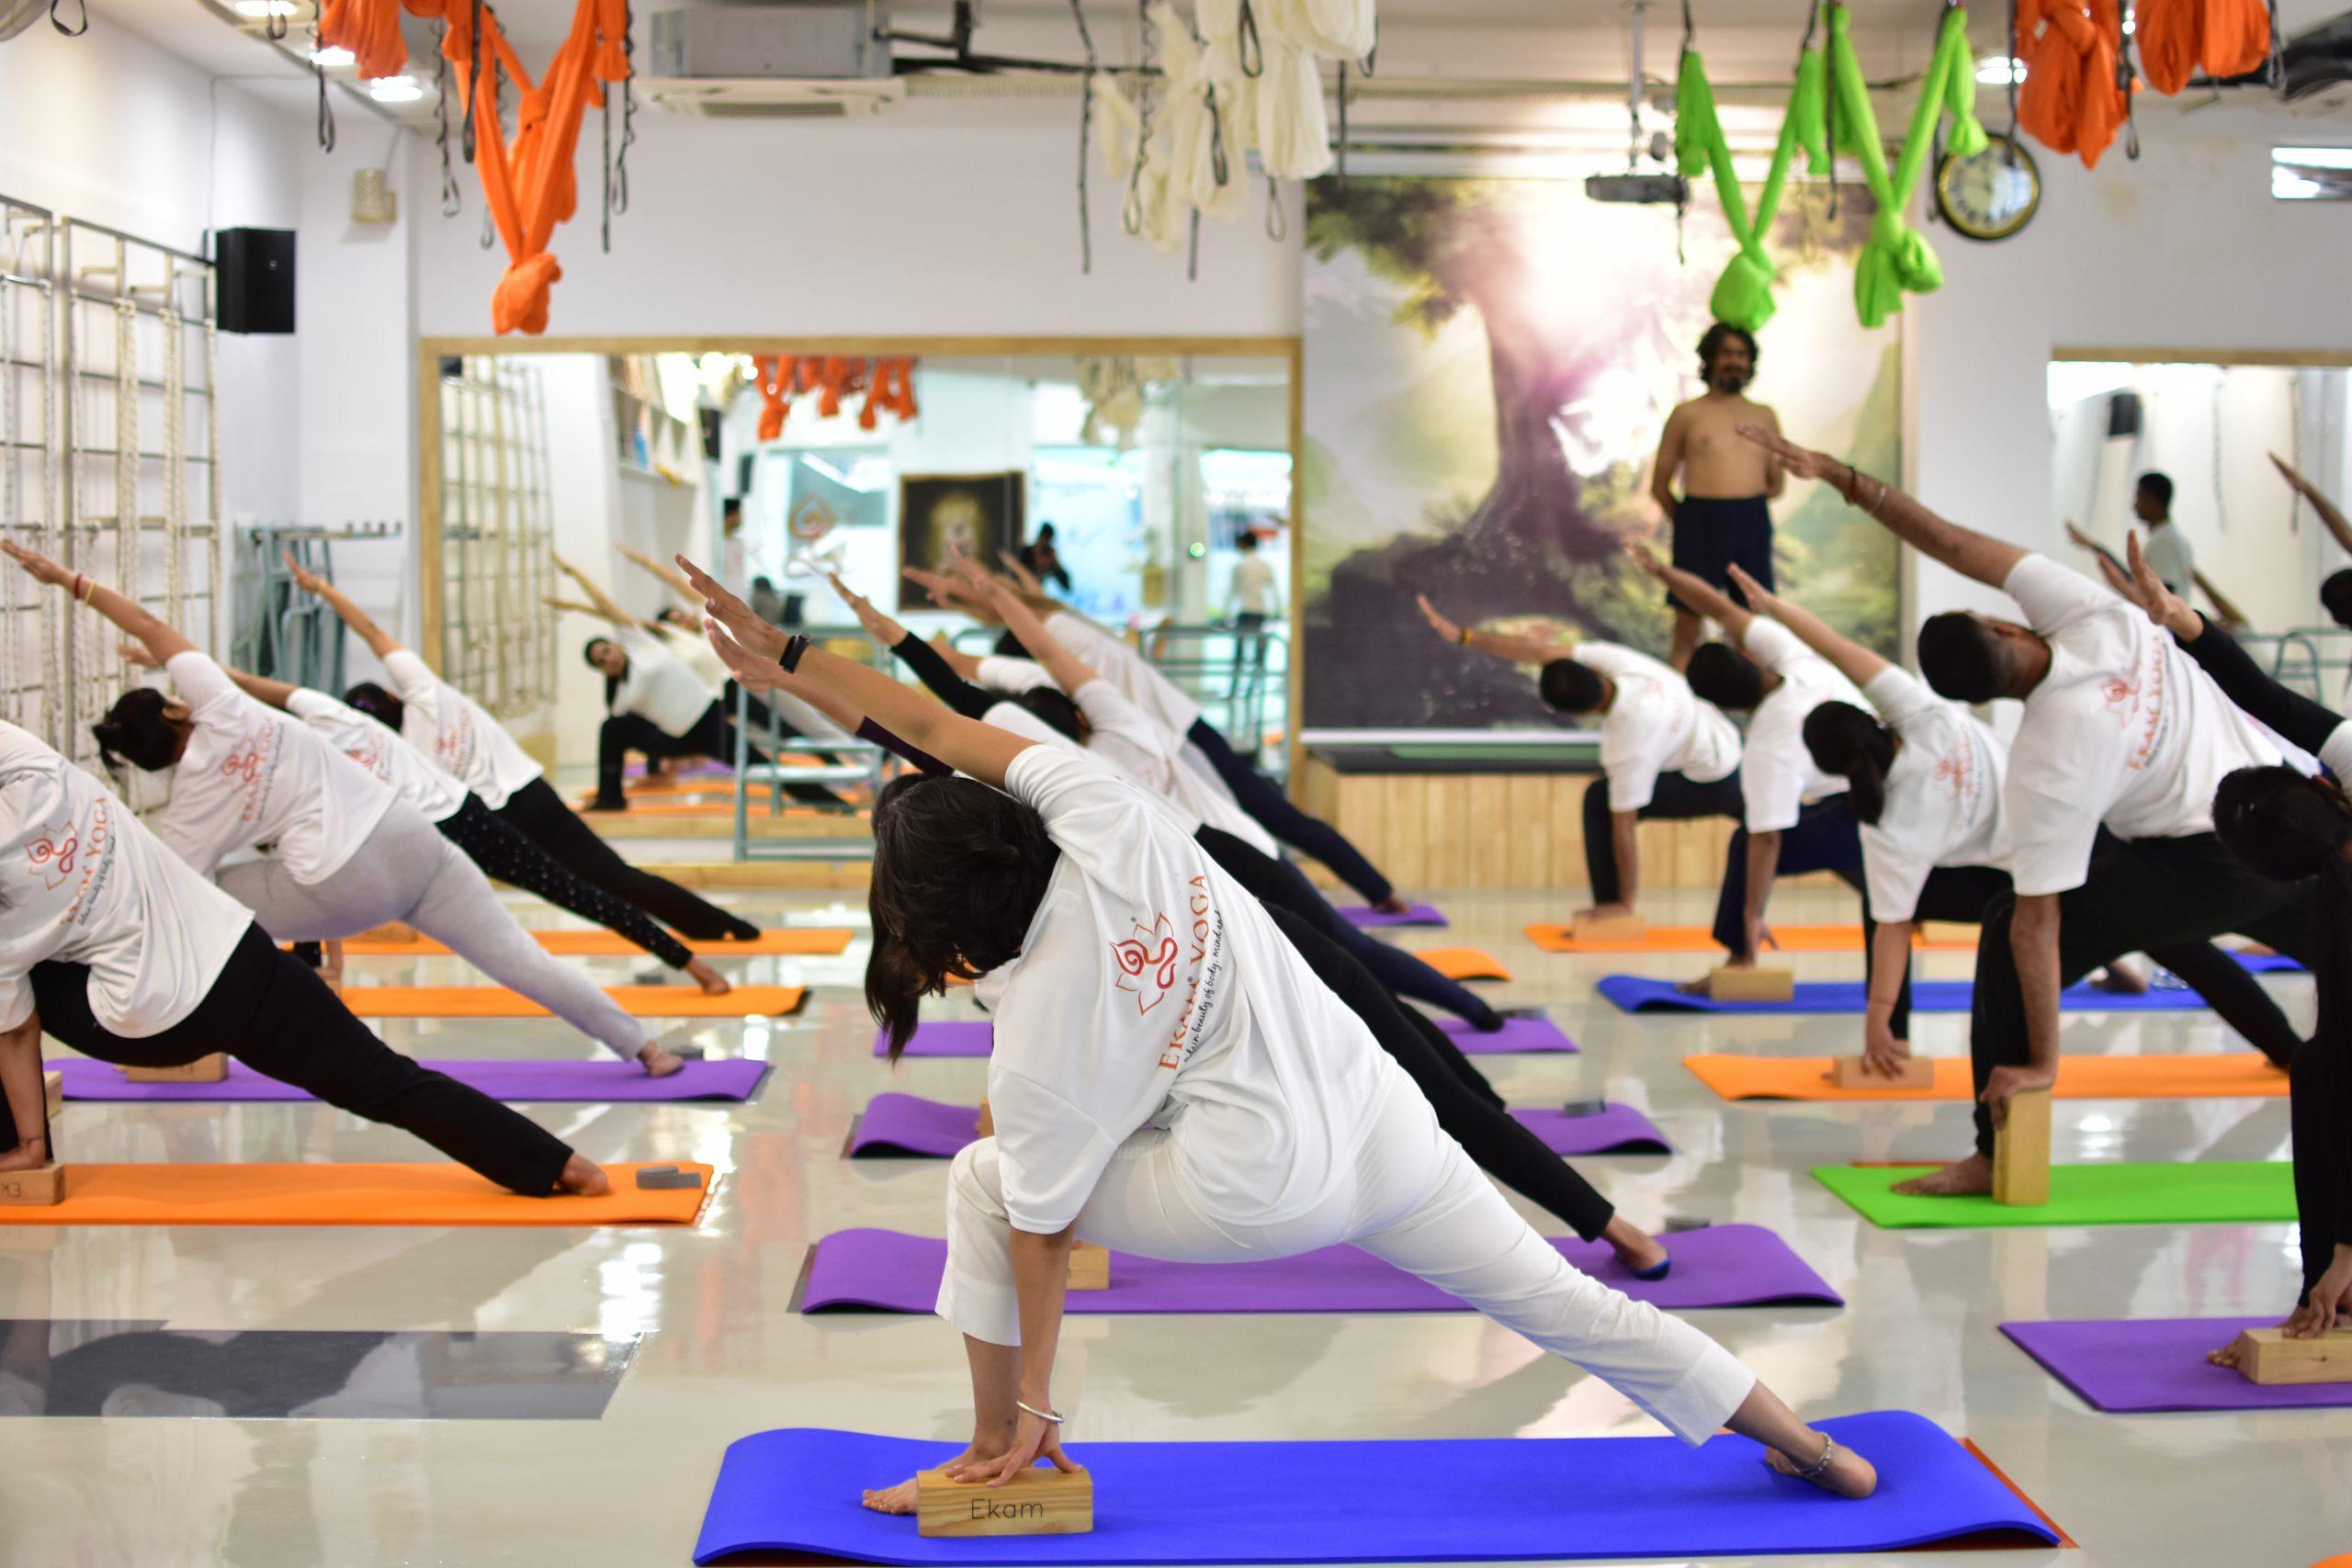 Therapeutic Yoga at Yoga Studio - Ekam Yoga